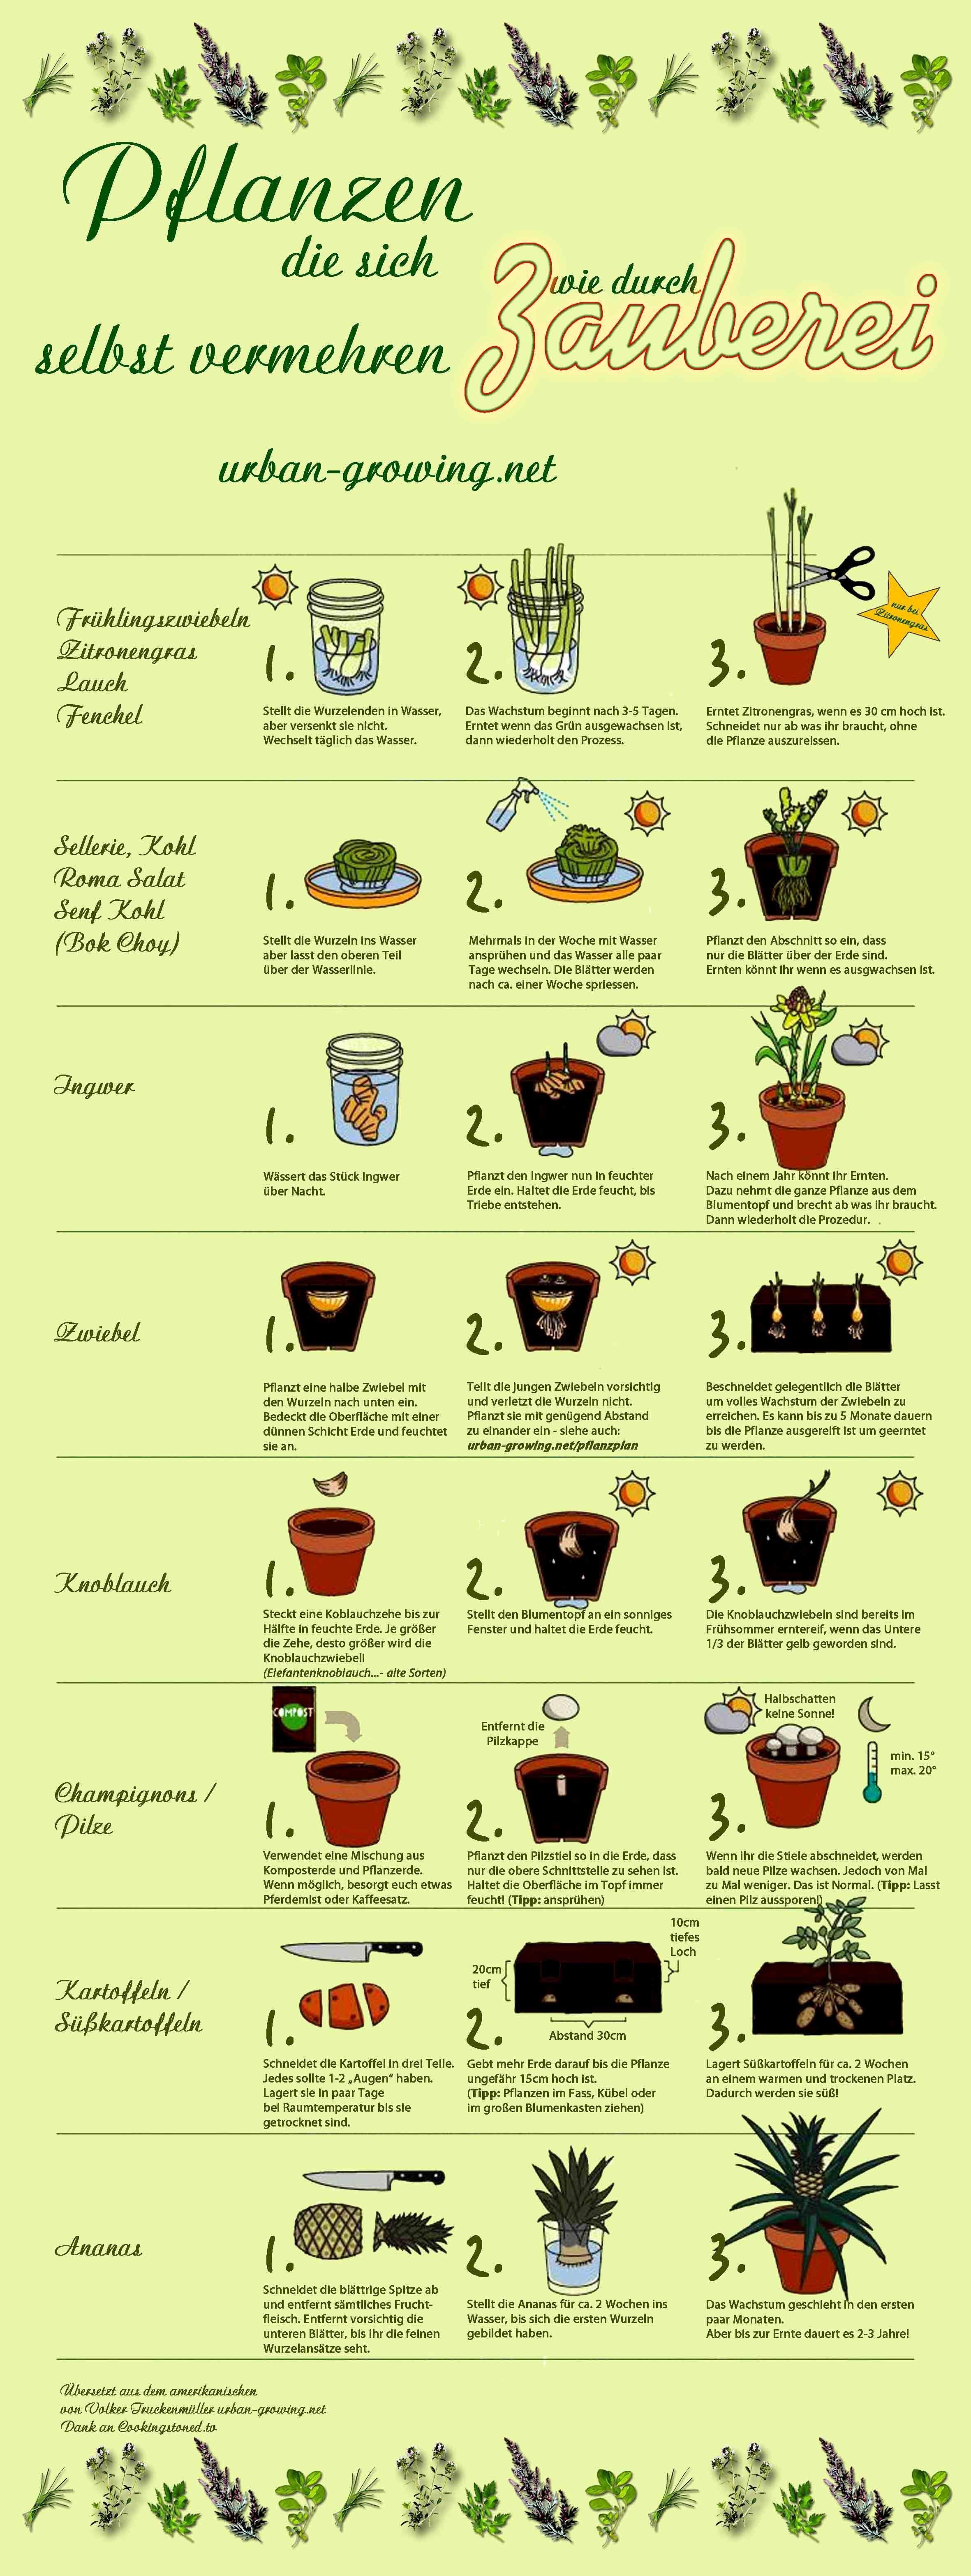 # propagation des plantes #wwwurbangrowingnet #zauberei #grtnern #kinder –